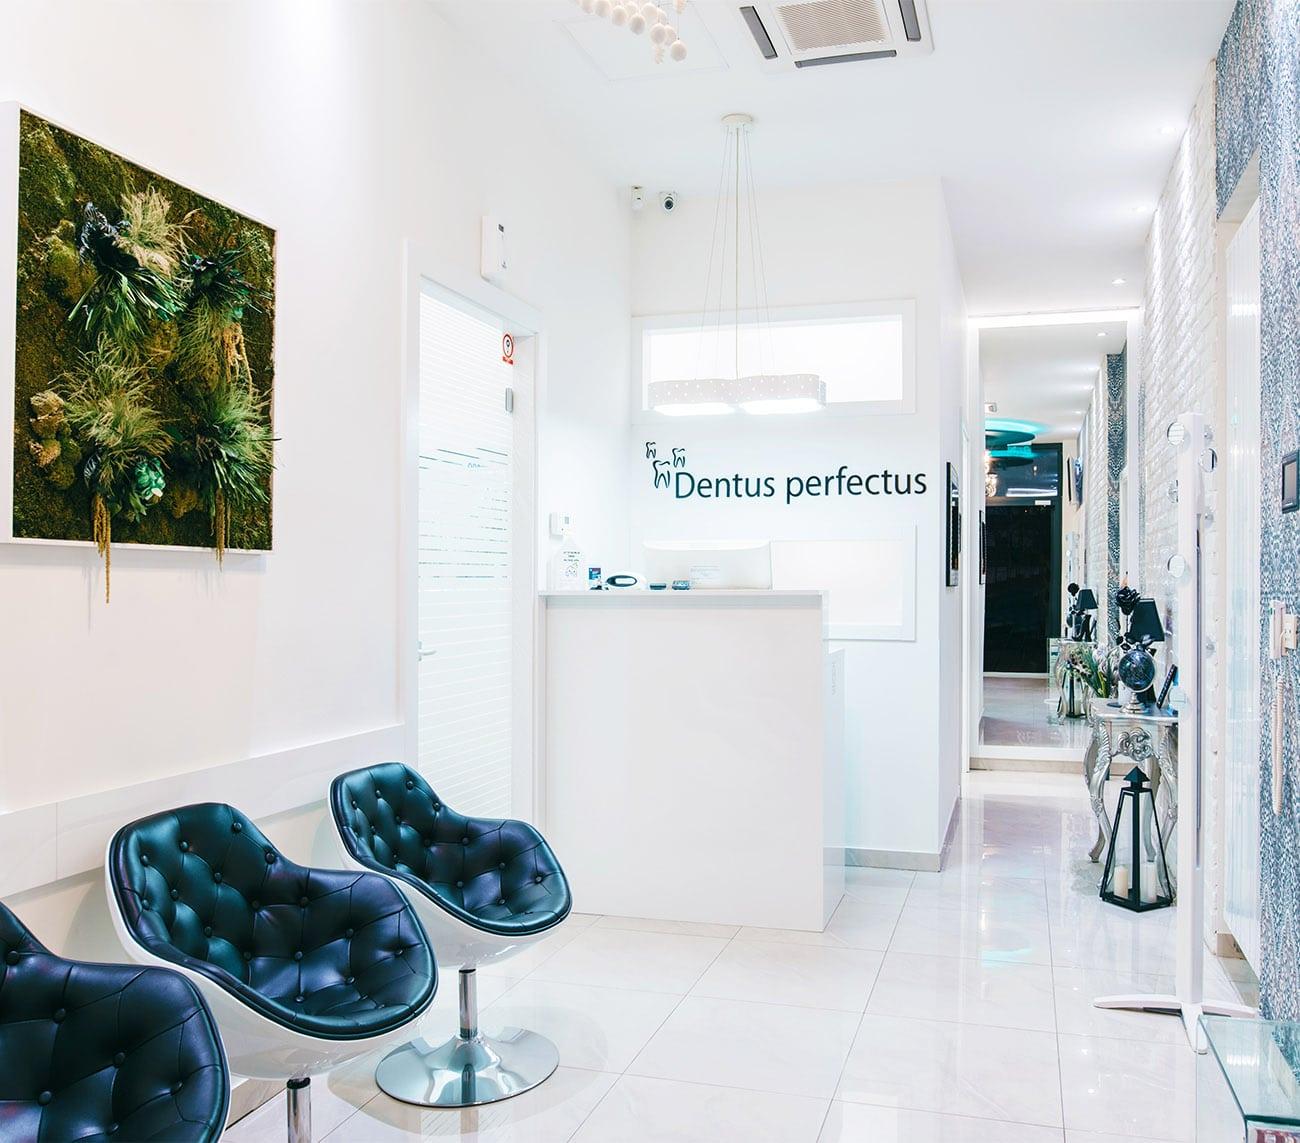 Dentus perfectus - stomatološki pregled - novi pacijenti